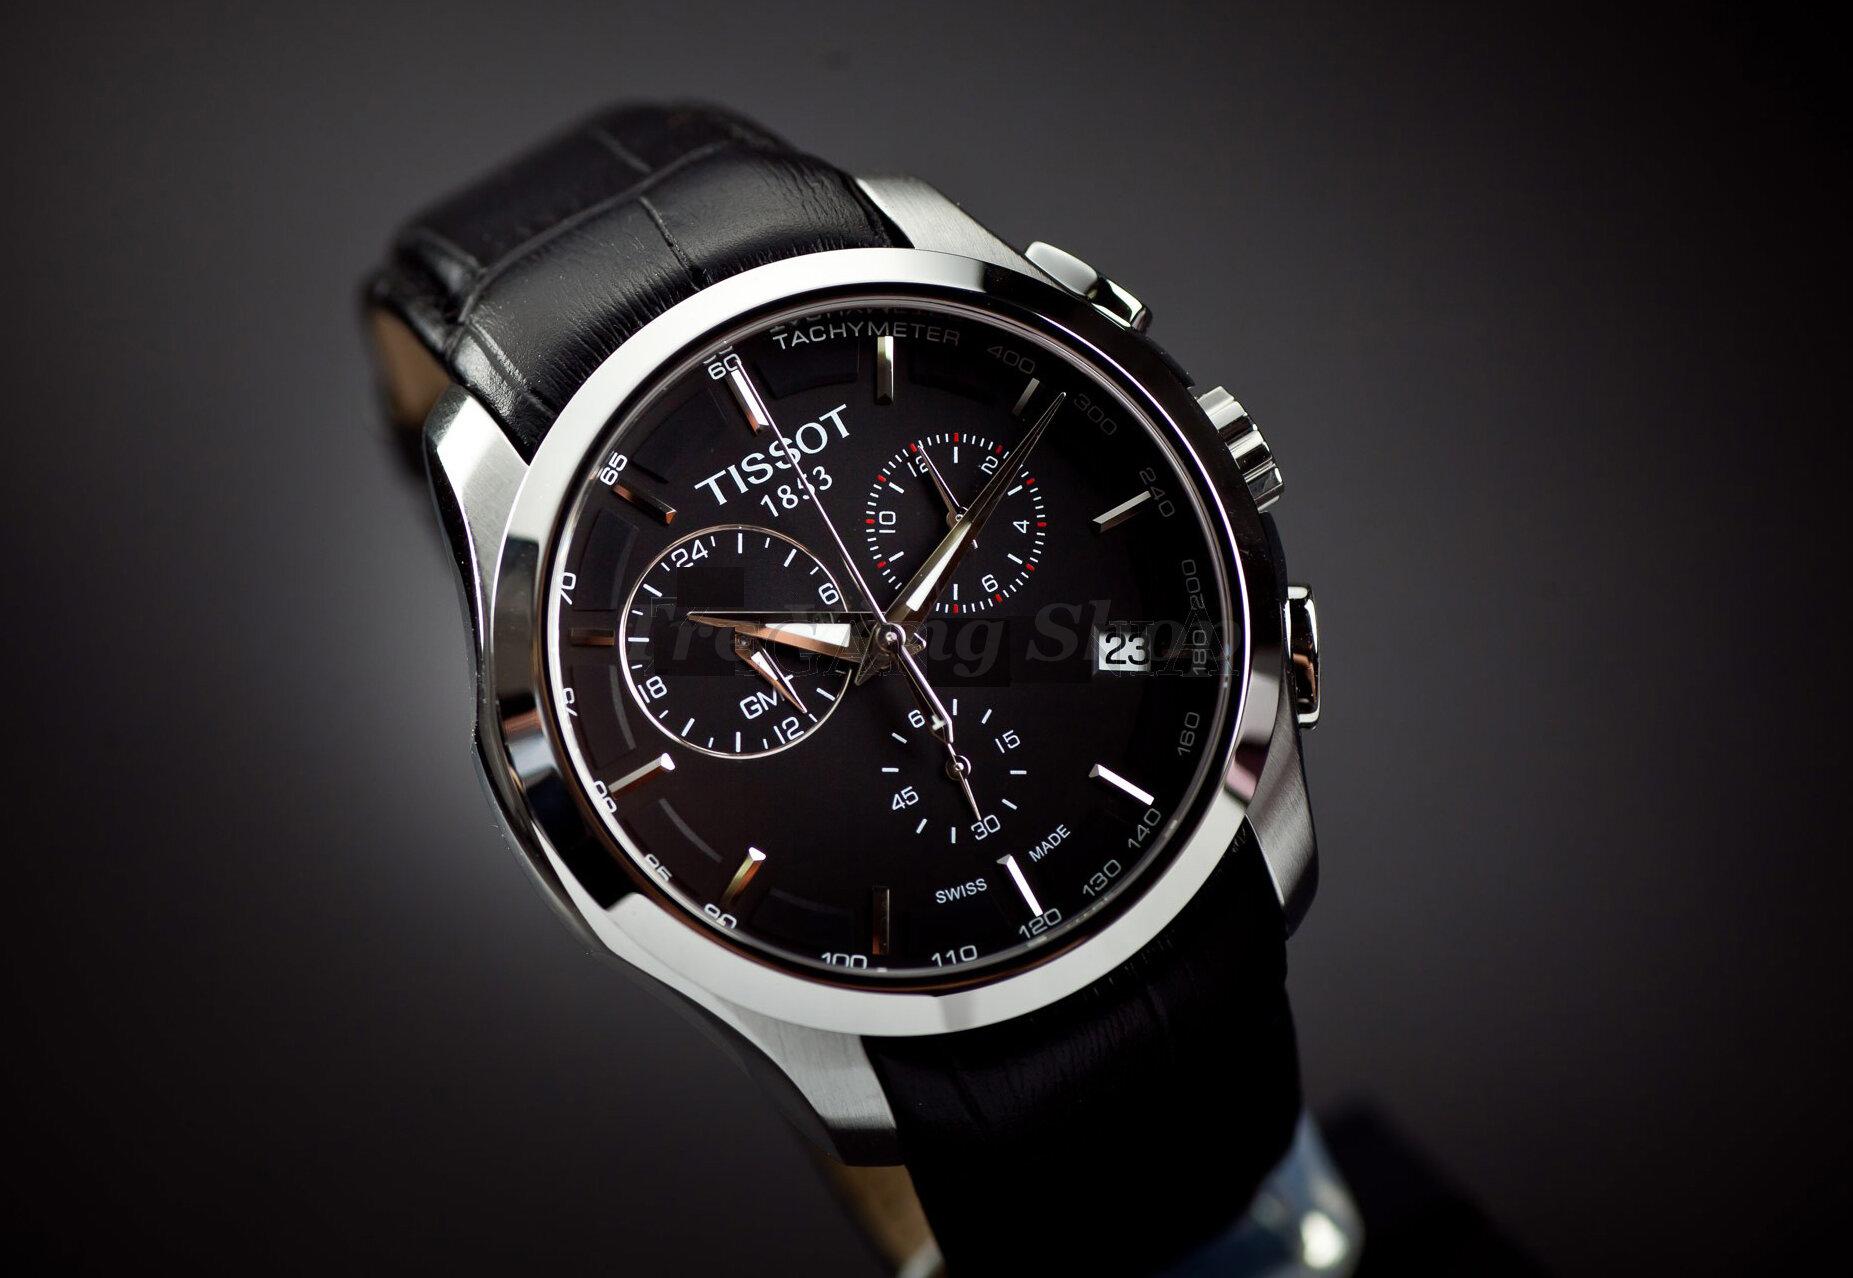 Đồng hồ nam Tissot T035.439.16.051.00